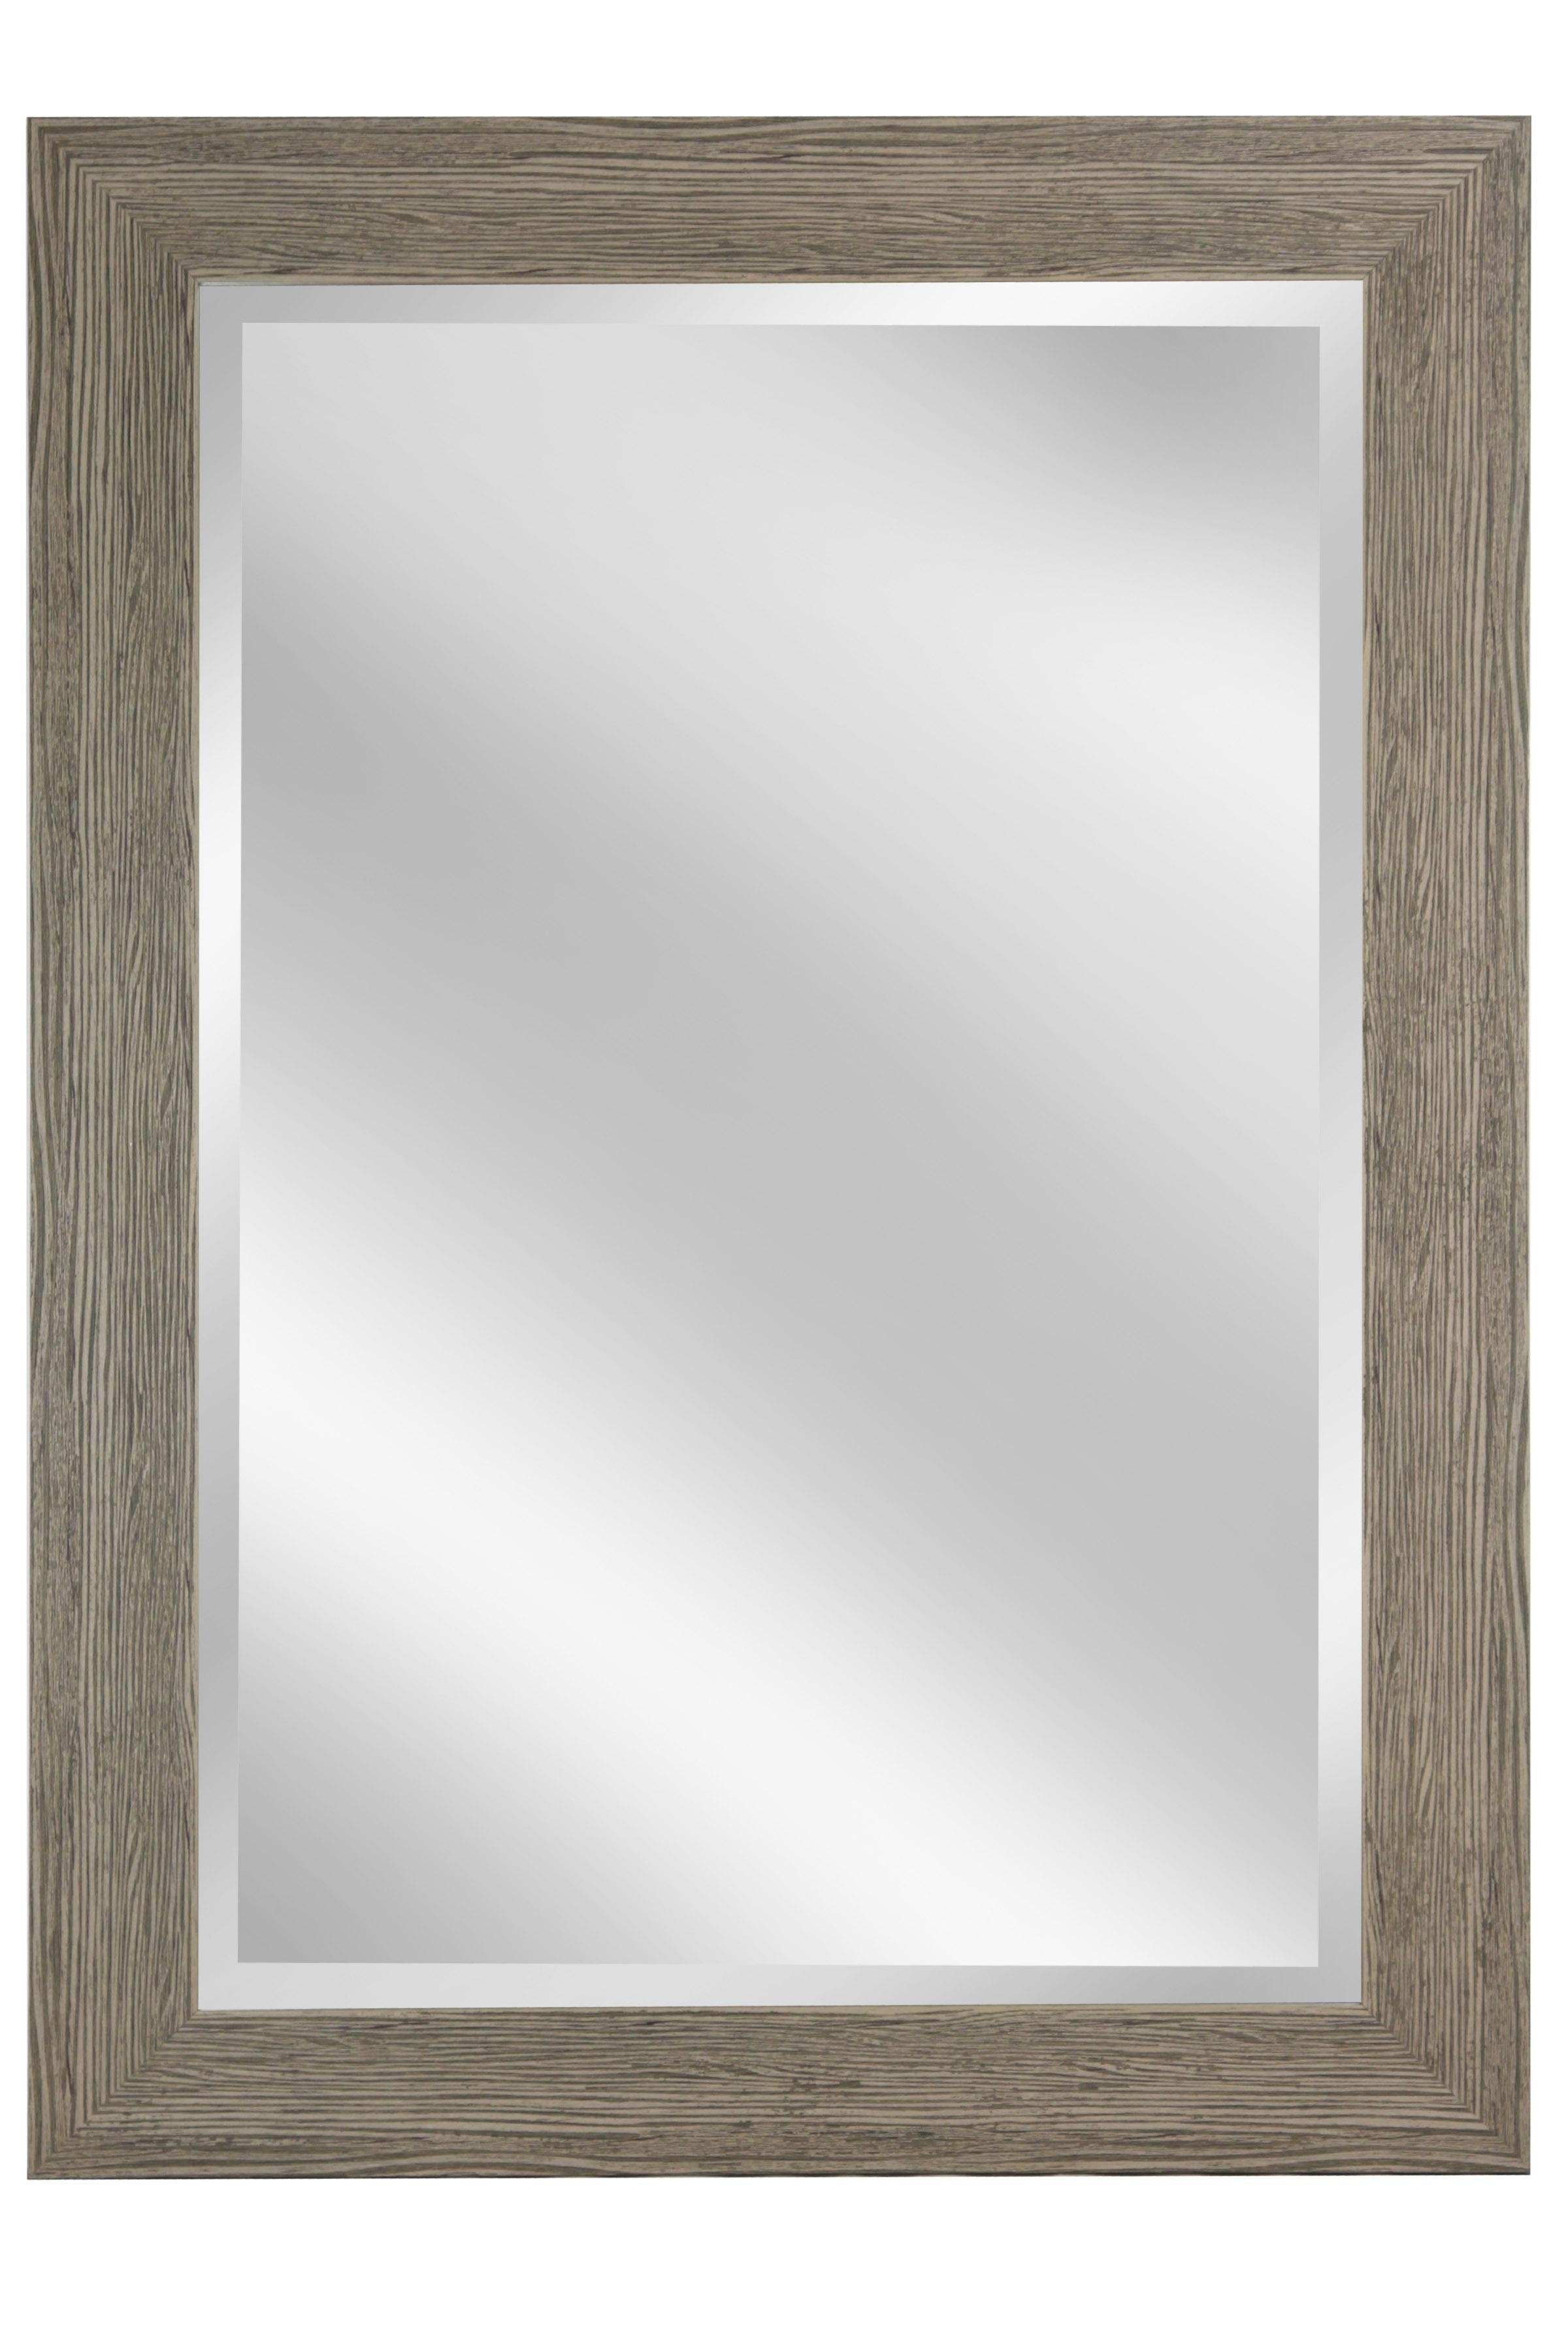 "46"" Beveled Mirror - Weathered Gray"